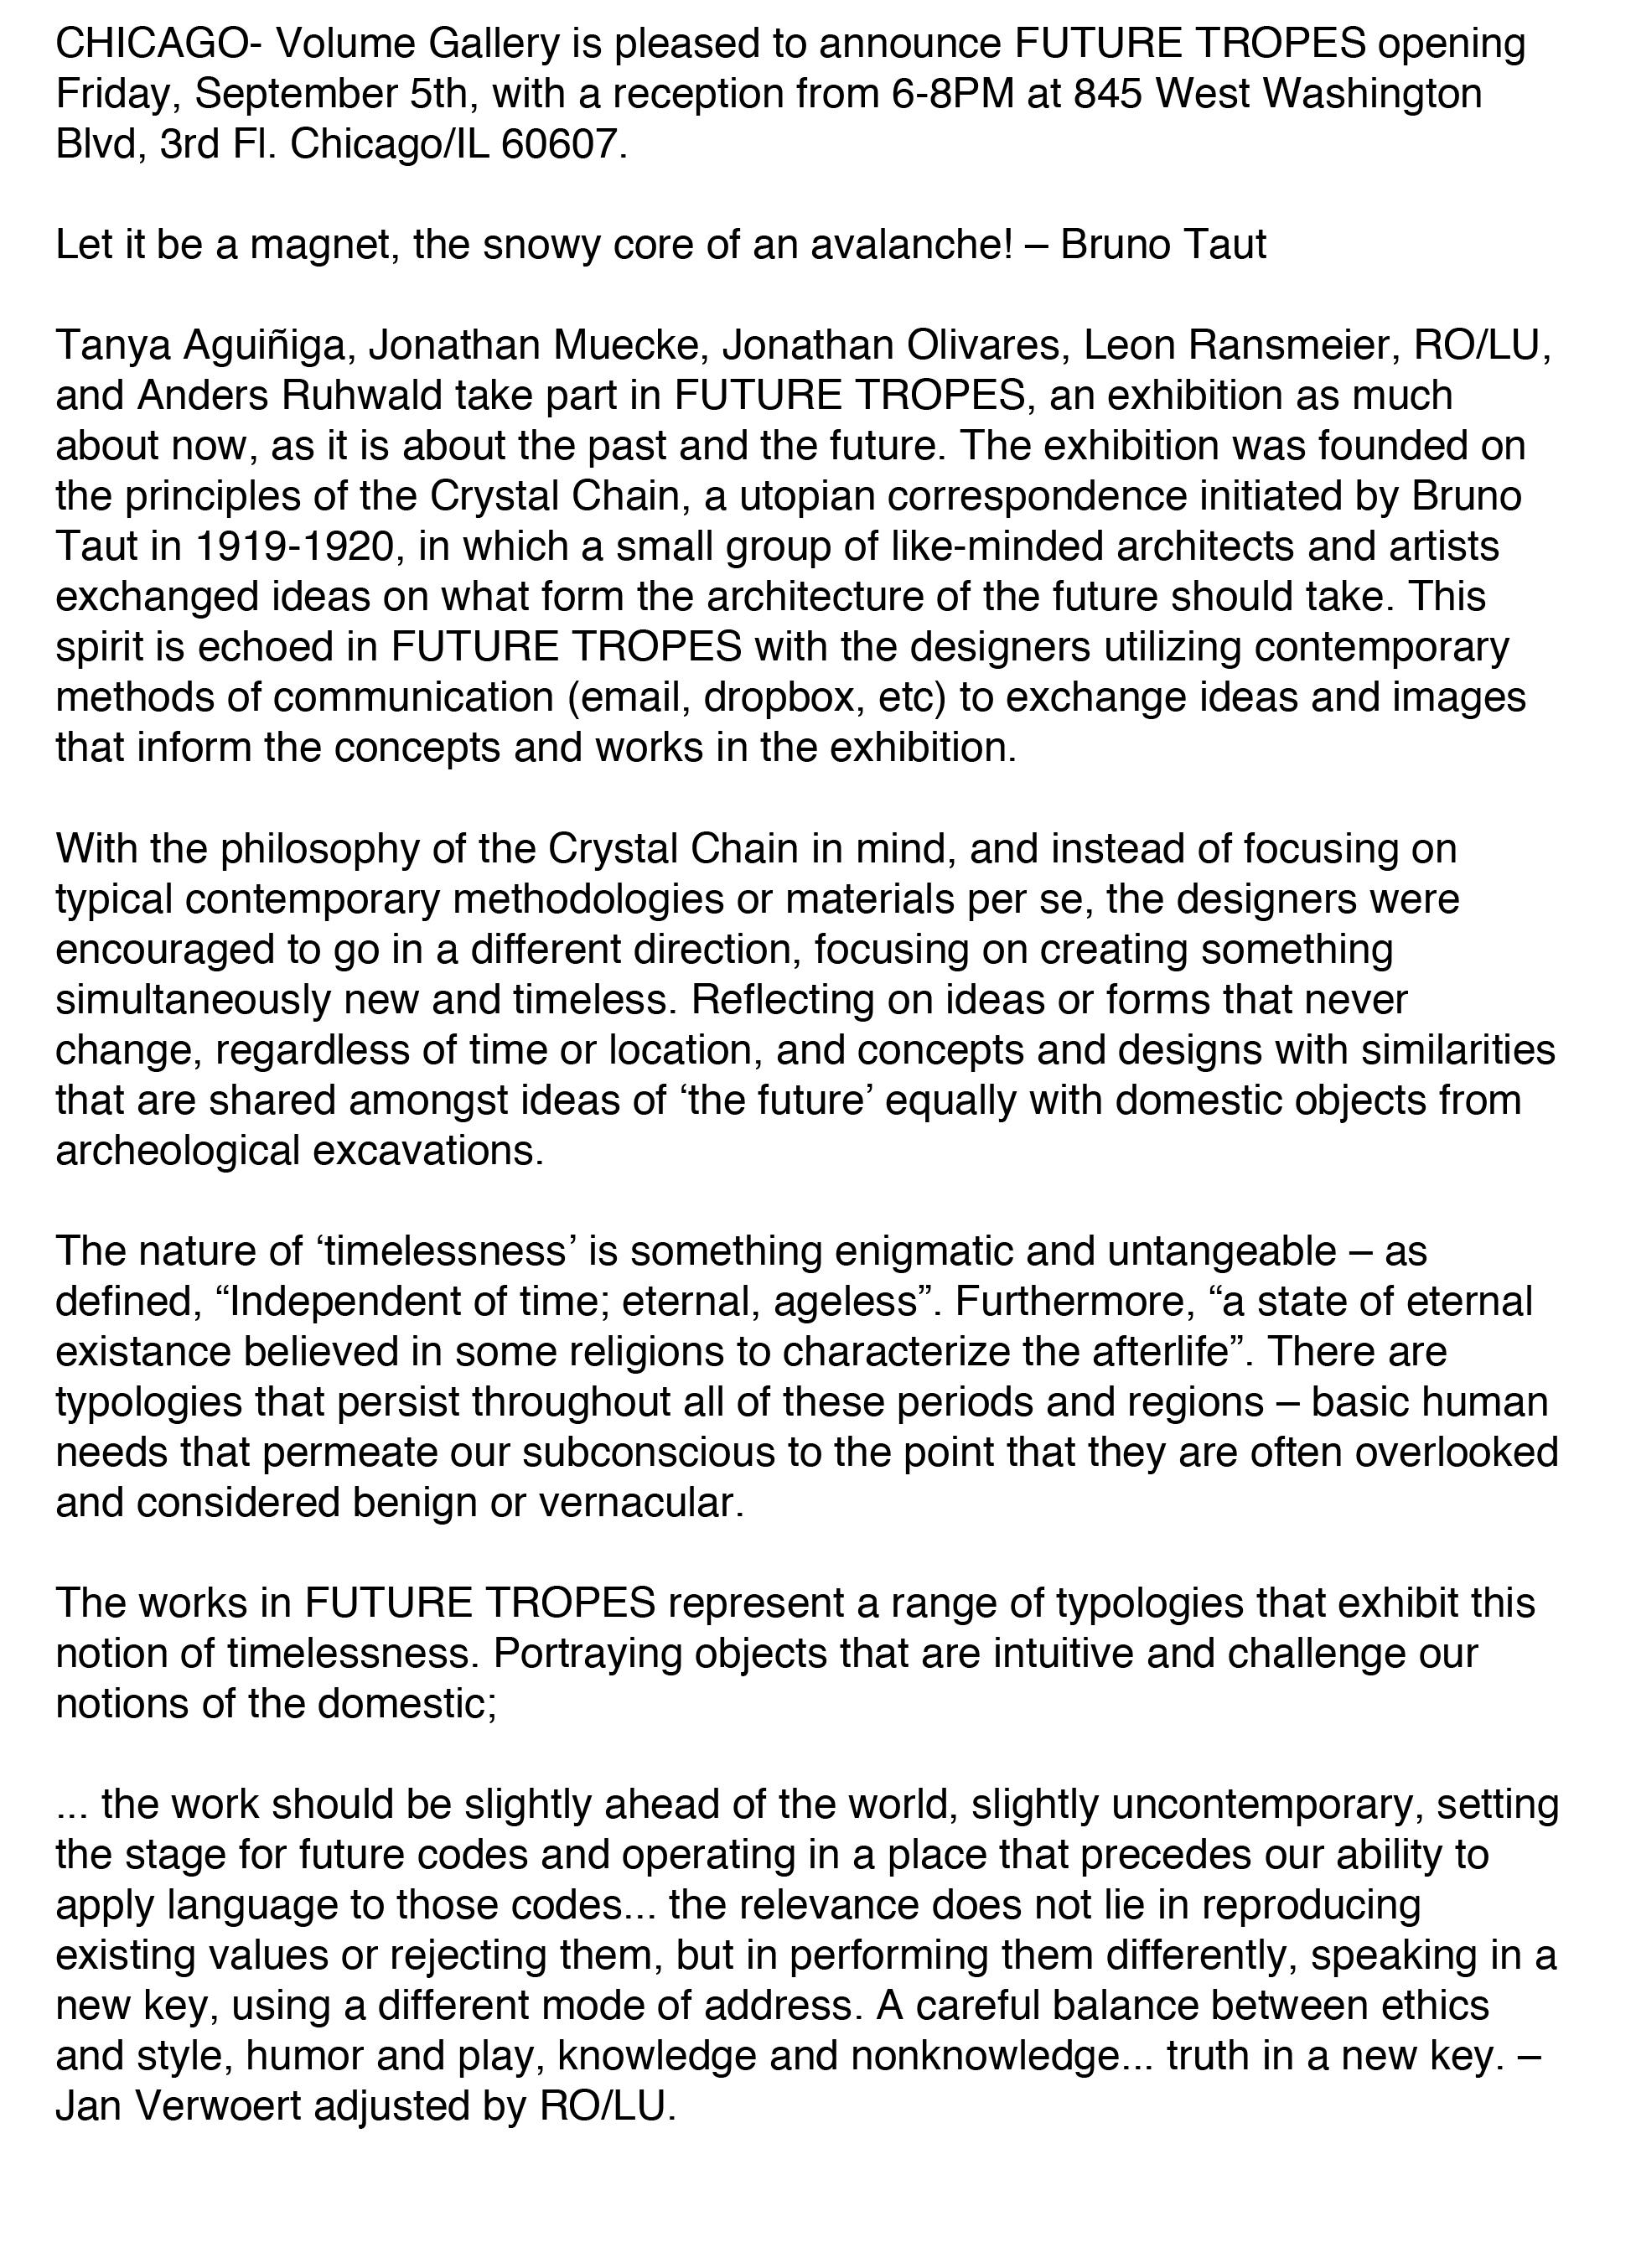 FutureTropes-PRtext-pg1.jpg